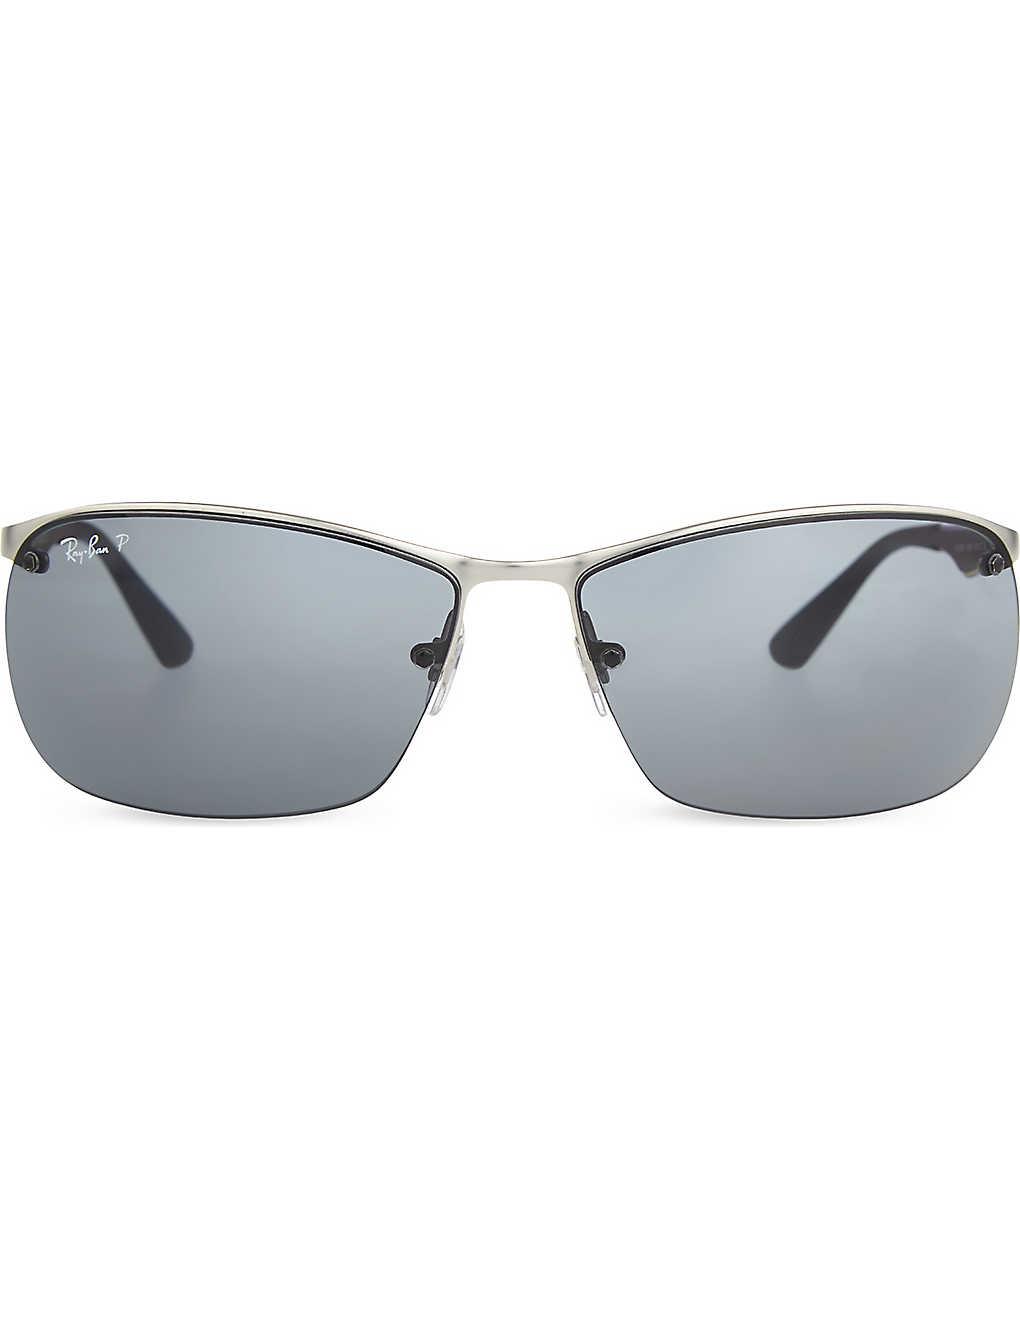 2fb114def5f RAY-BAN - RB3550 D-frame sunglasses sunglasses